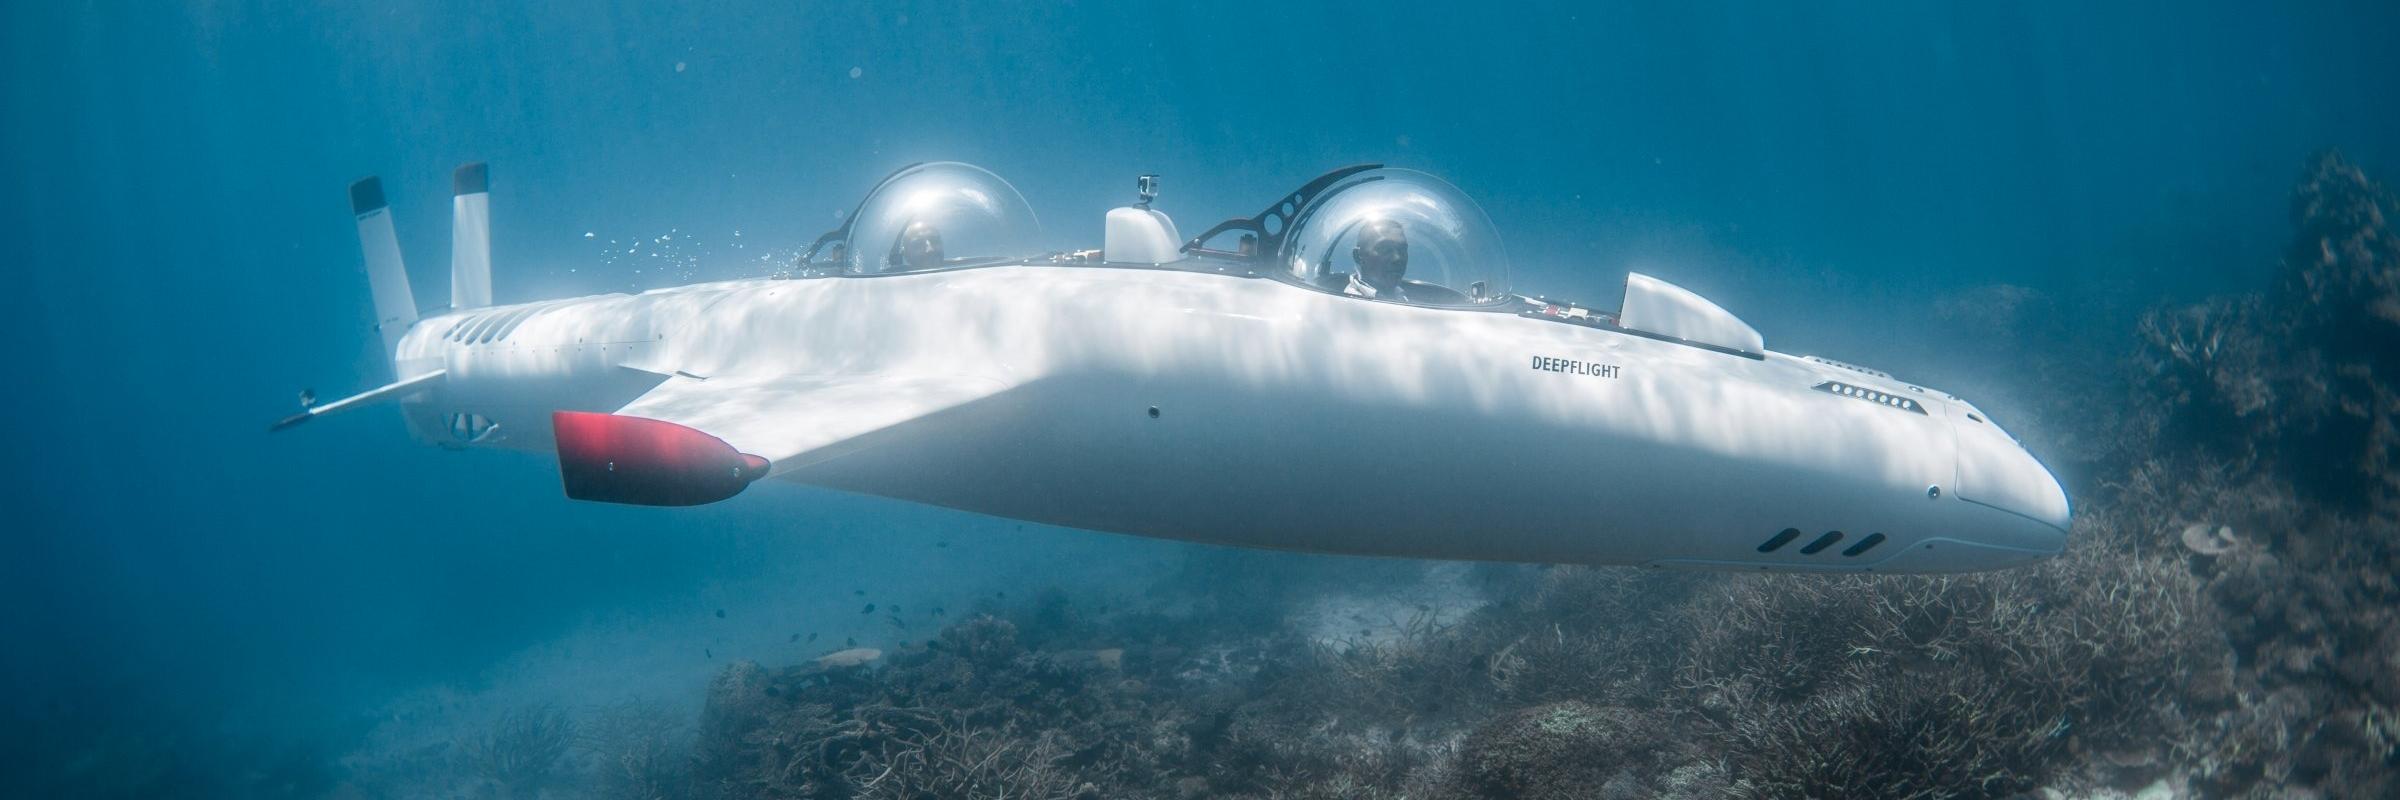 https://gody.vn/blog/review-tour-du-lich-vetham-quan/post/trai-nghiem-kham-pha-dai-duong-bang-tau-ngam-tai-resort-sieu-sang-chanh-o-maldives-1127